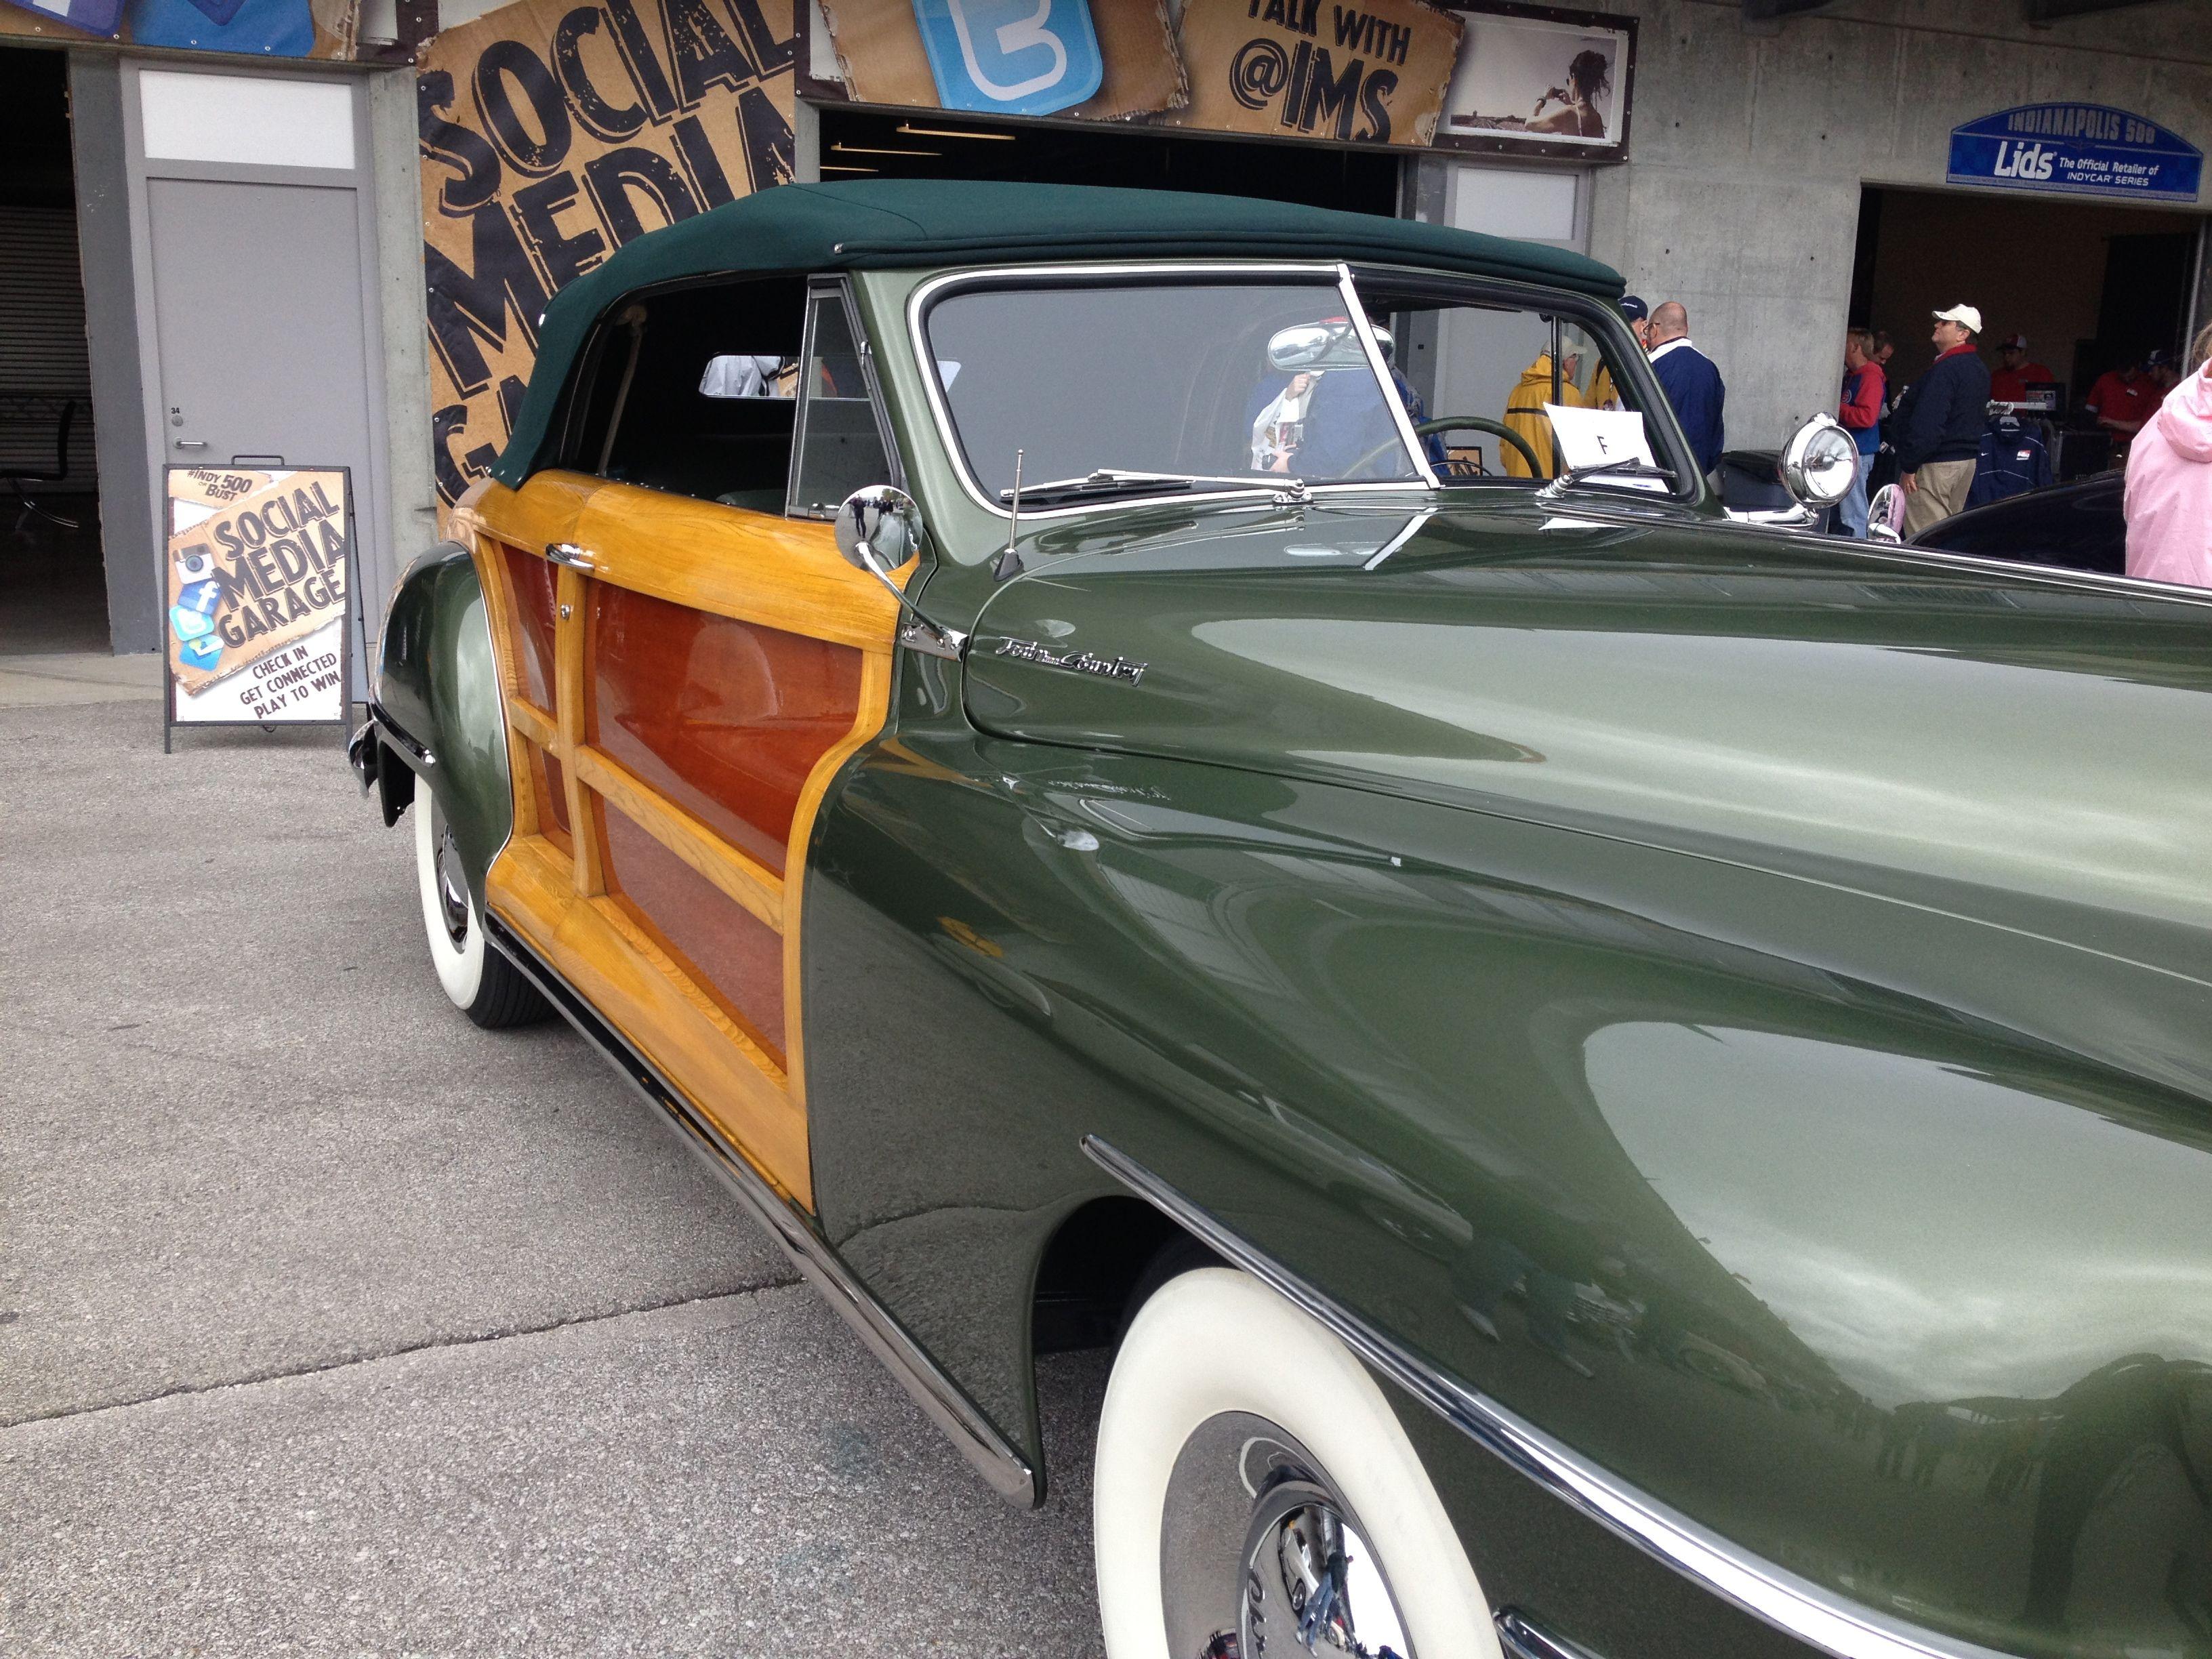 Celebration of Automobiles 2013, Indianapolis Motor